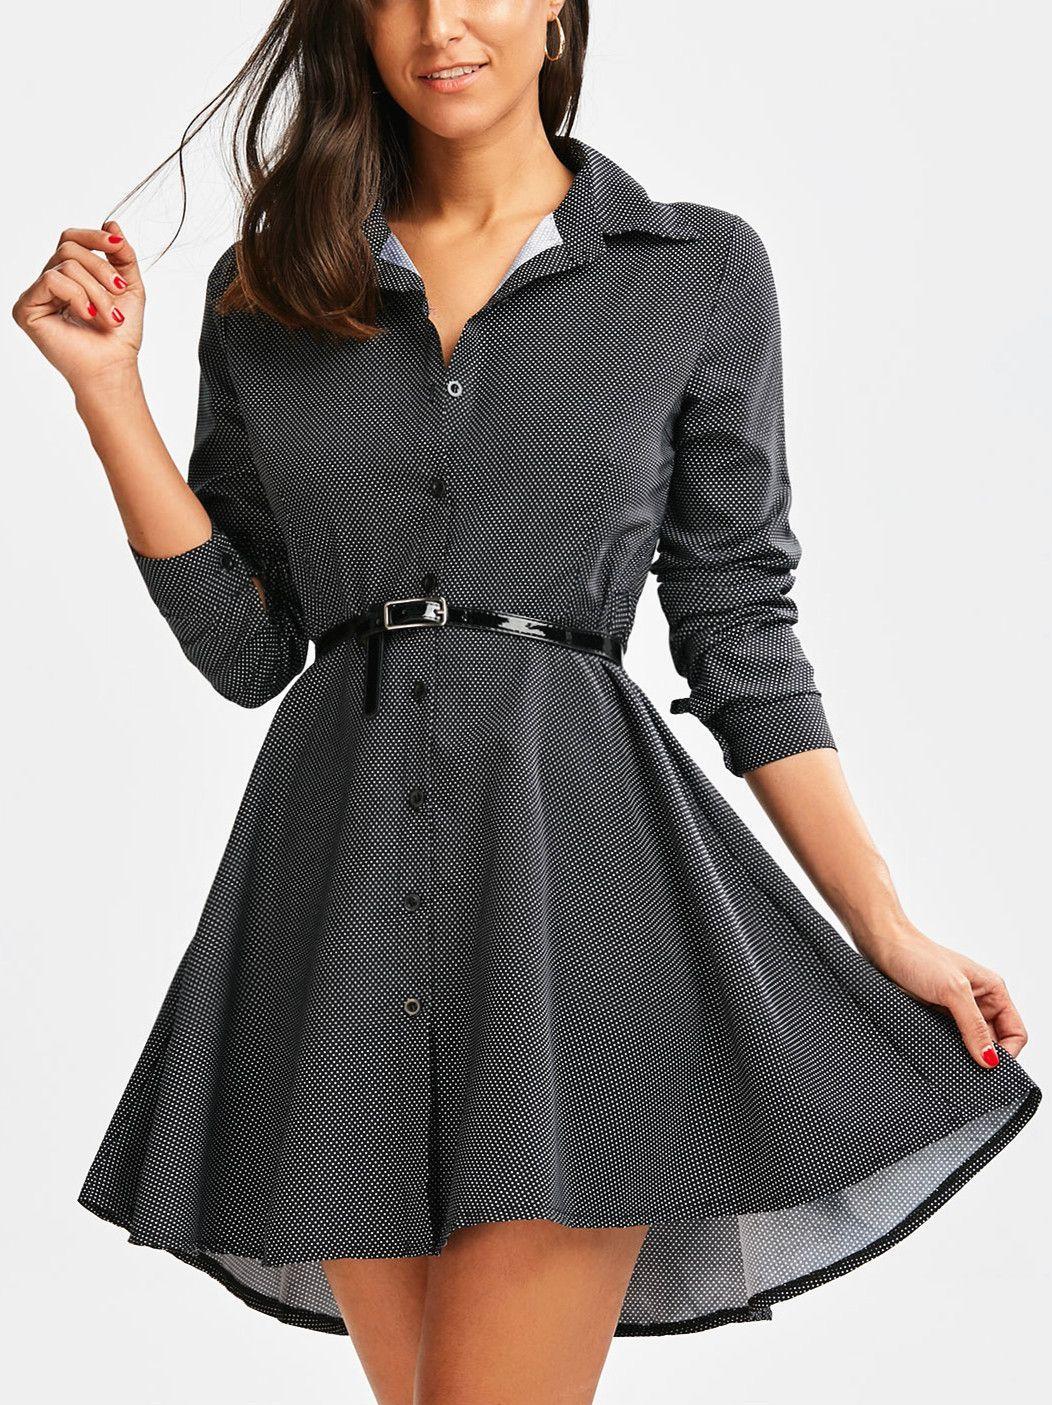 Vintage Dresses Retro Polka Dot Dresses Off The Shoulder Fitted Dresses Long Sleeve Black Lace Mini D Casual Dresses Casual Dresses For Women Dresses For Teens [ 1405 x 1052 Pixel ]